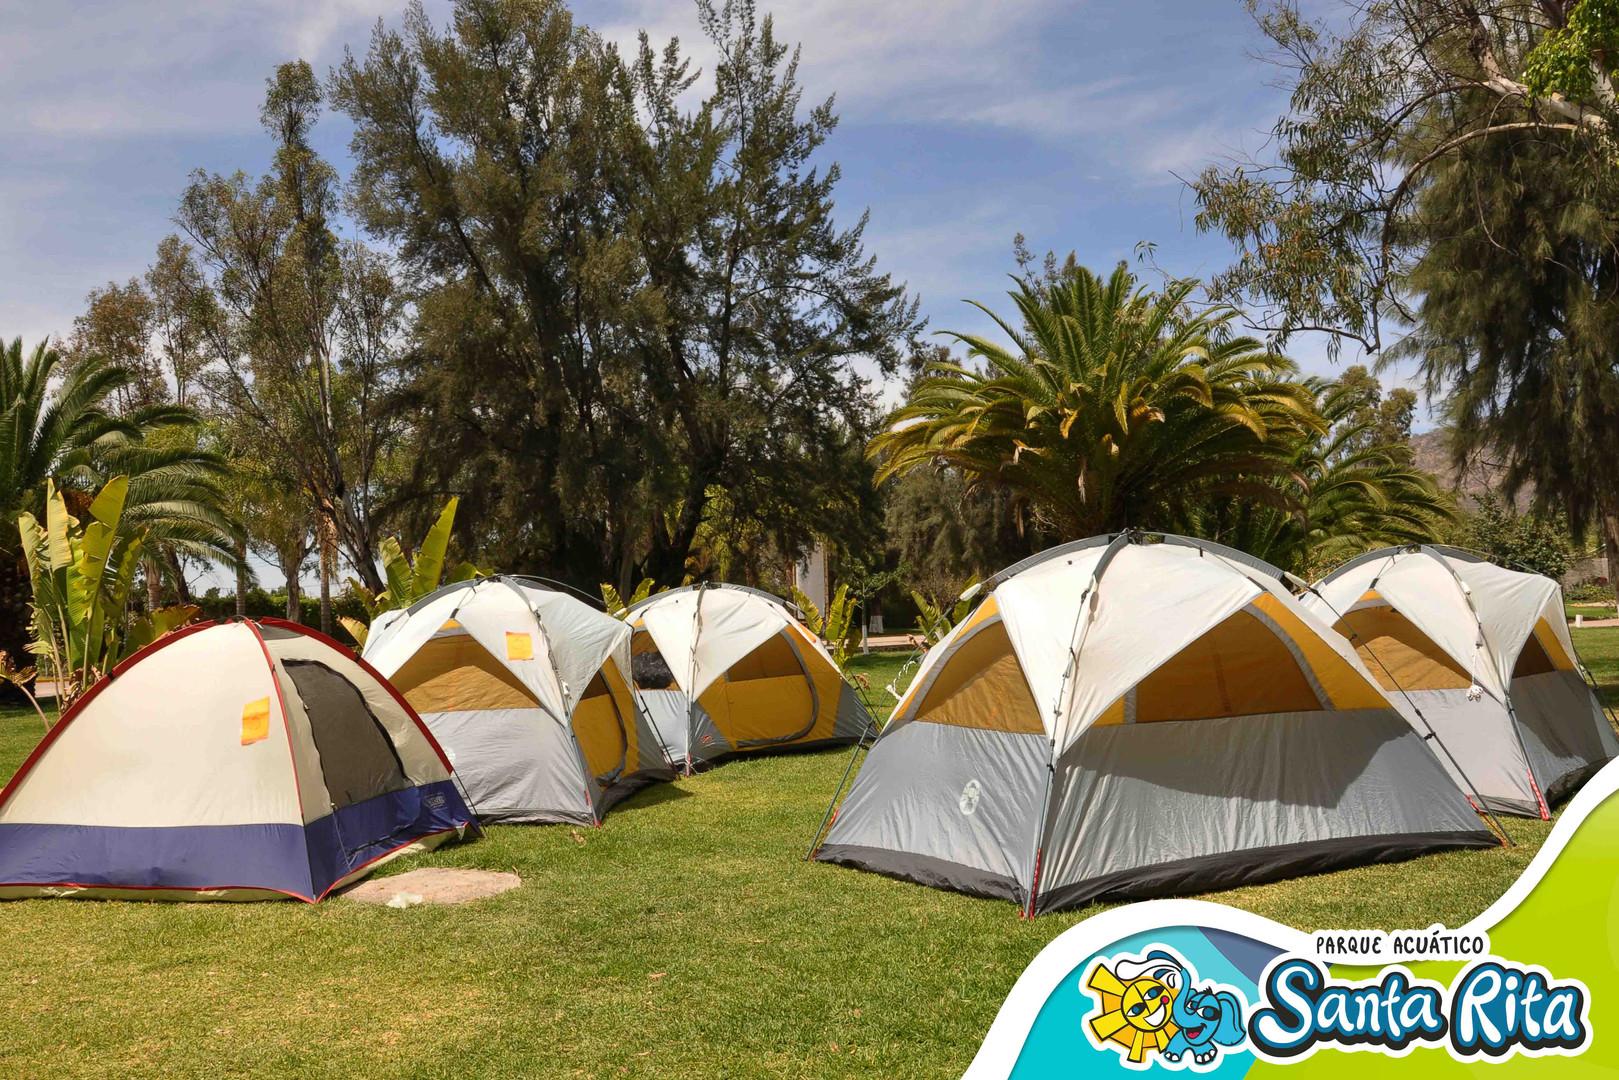 Campingparqueacuaticosantarita.jpg